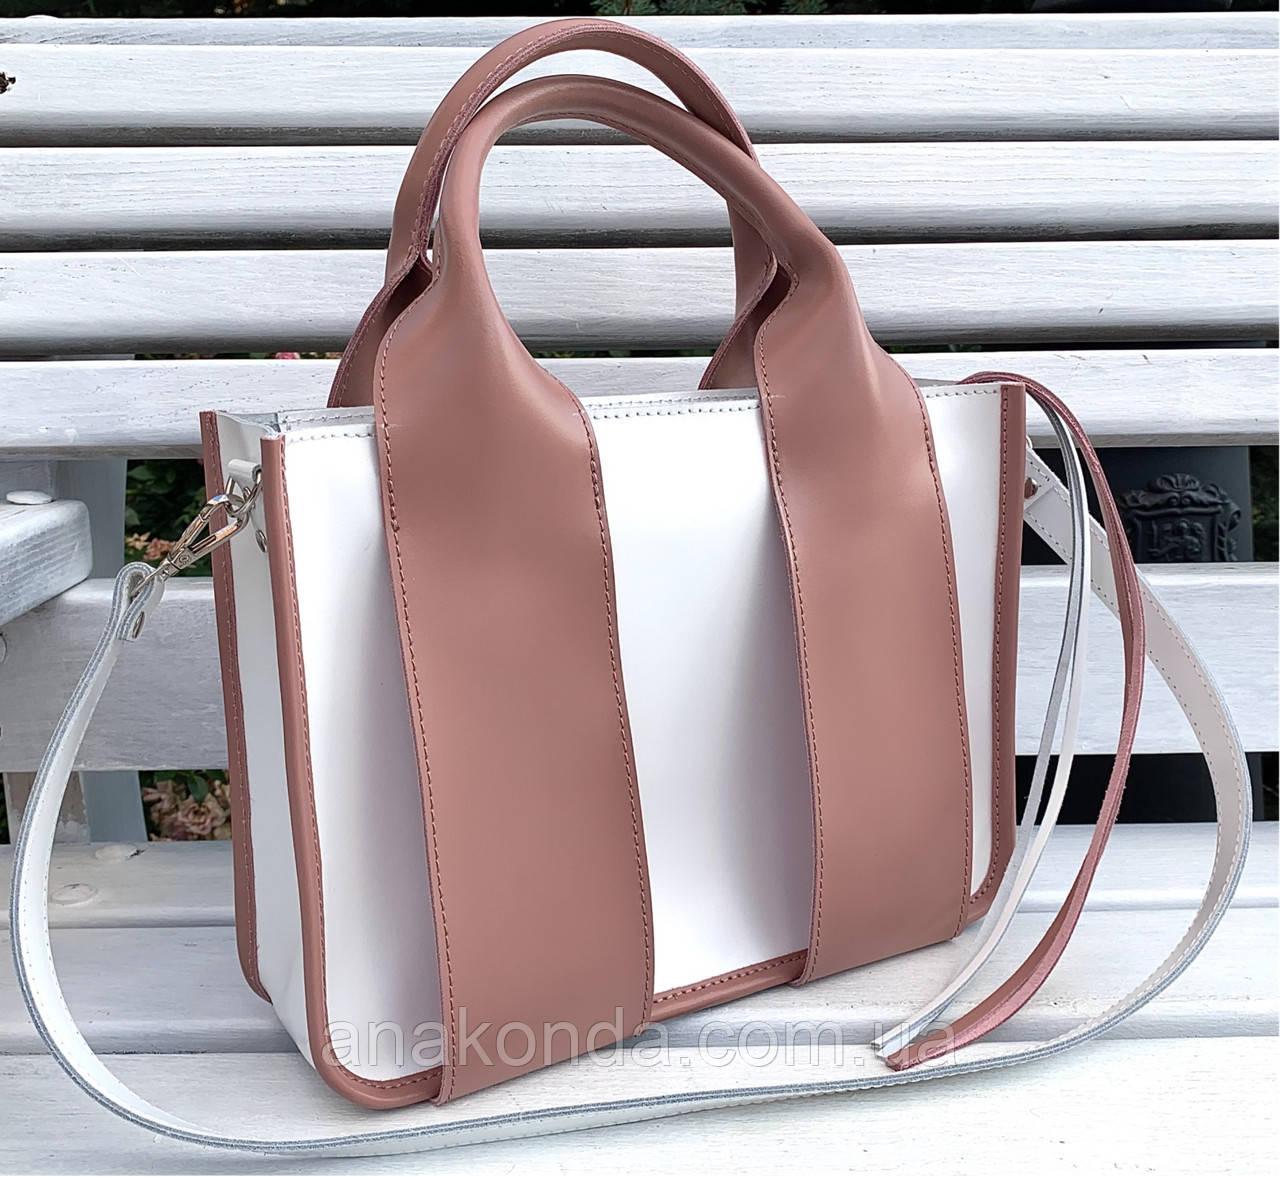 685-XL Натуральная кожа Сумка женская белая кожаная пудровая женская сумка из натуральной кожи А4 формат